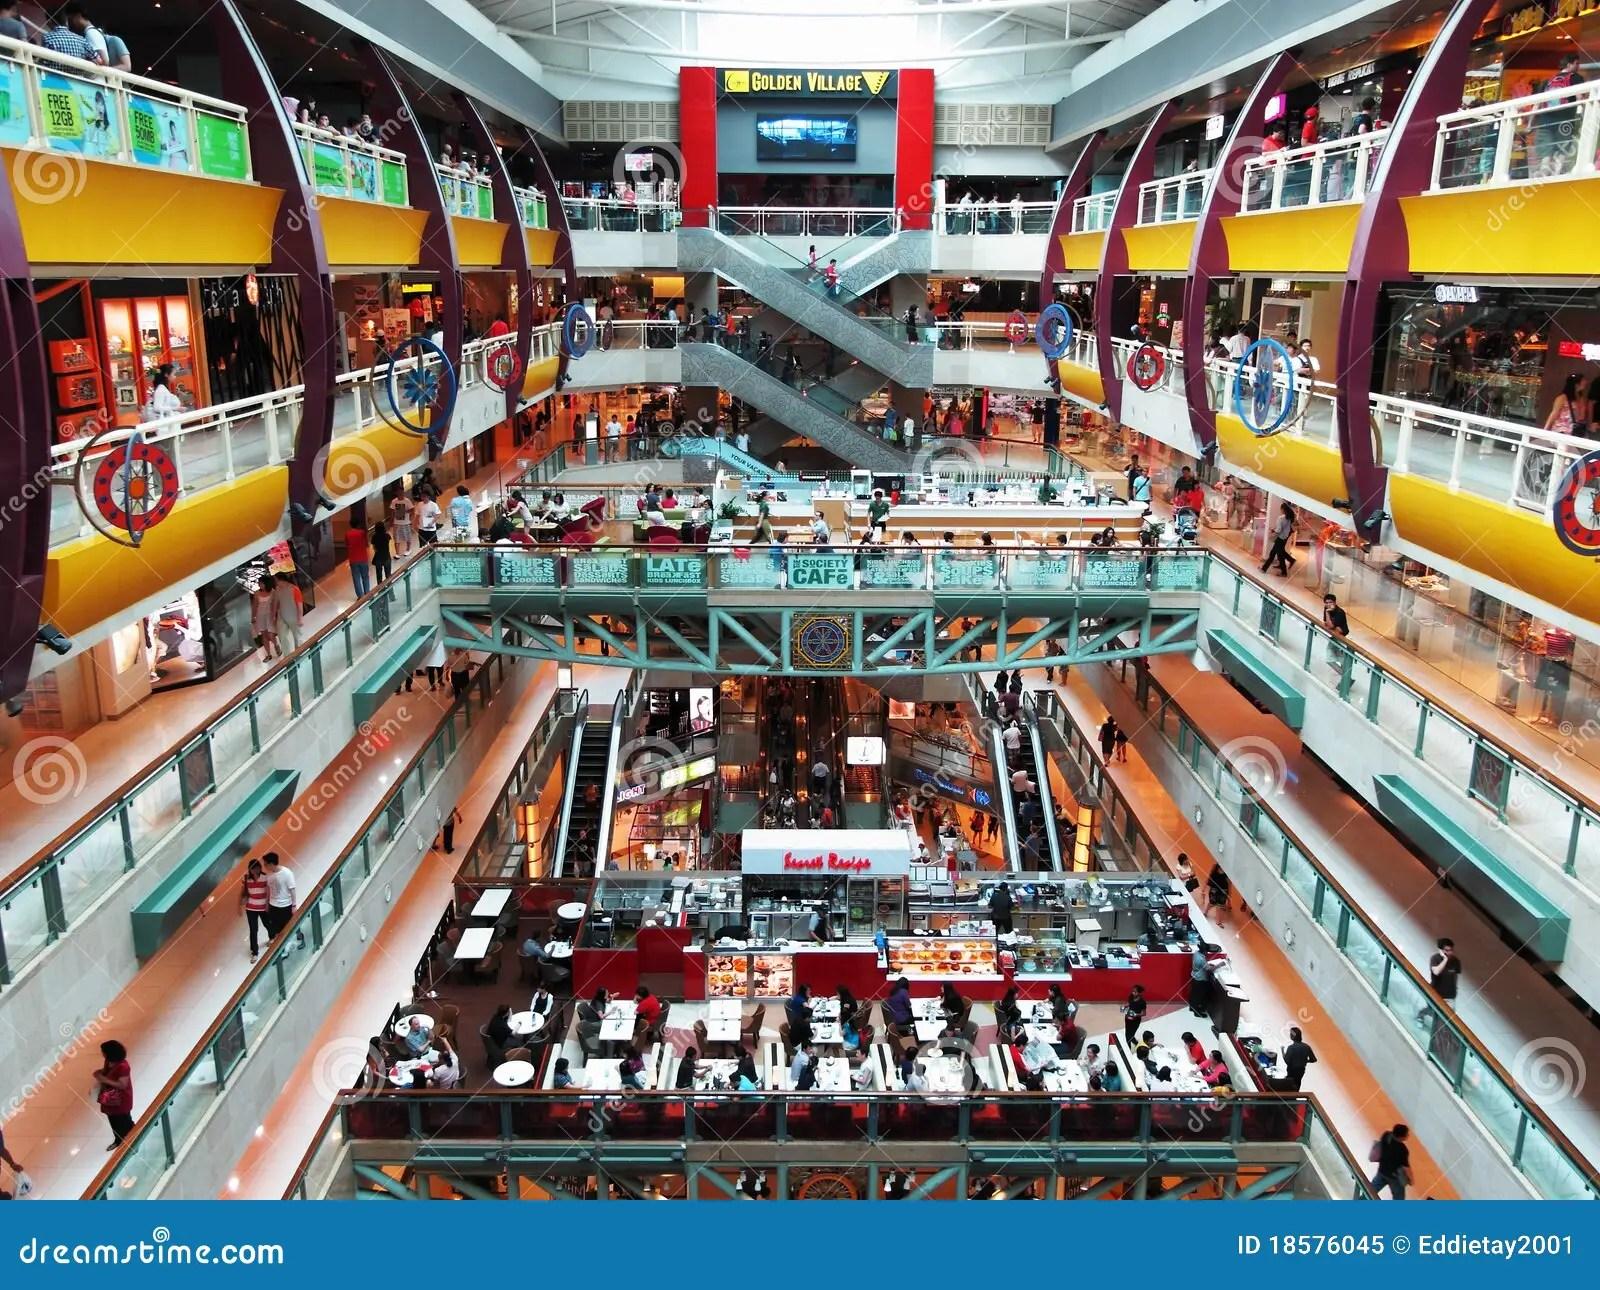 Inside Plaza Singapura Shopping Mall In Singapore